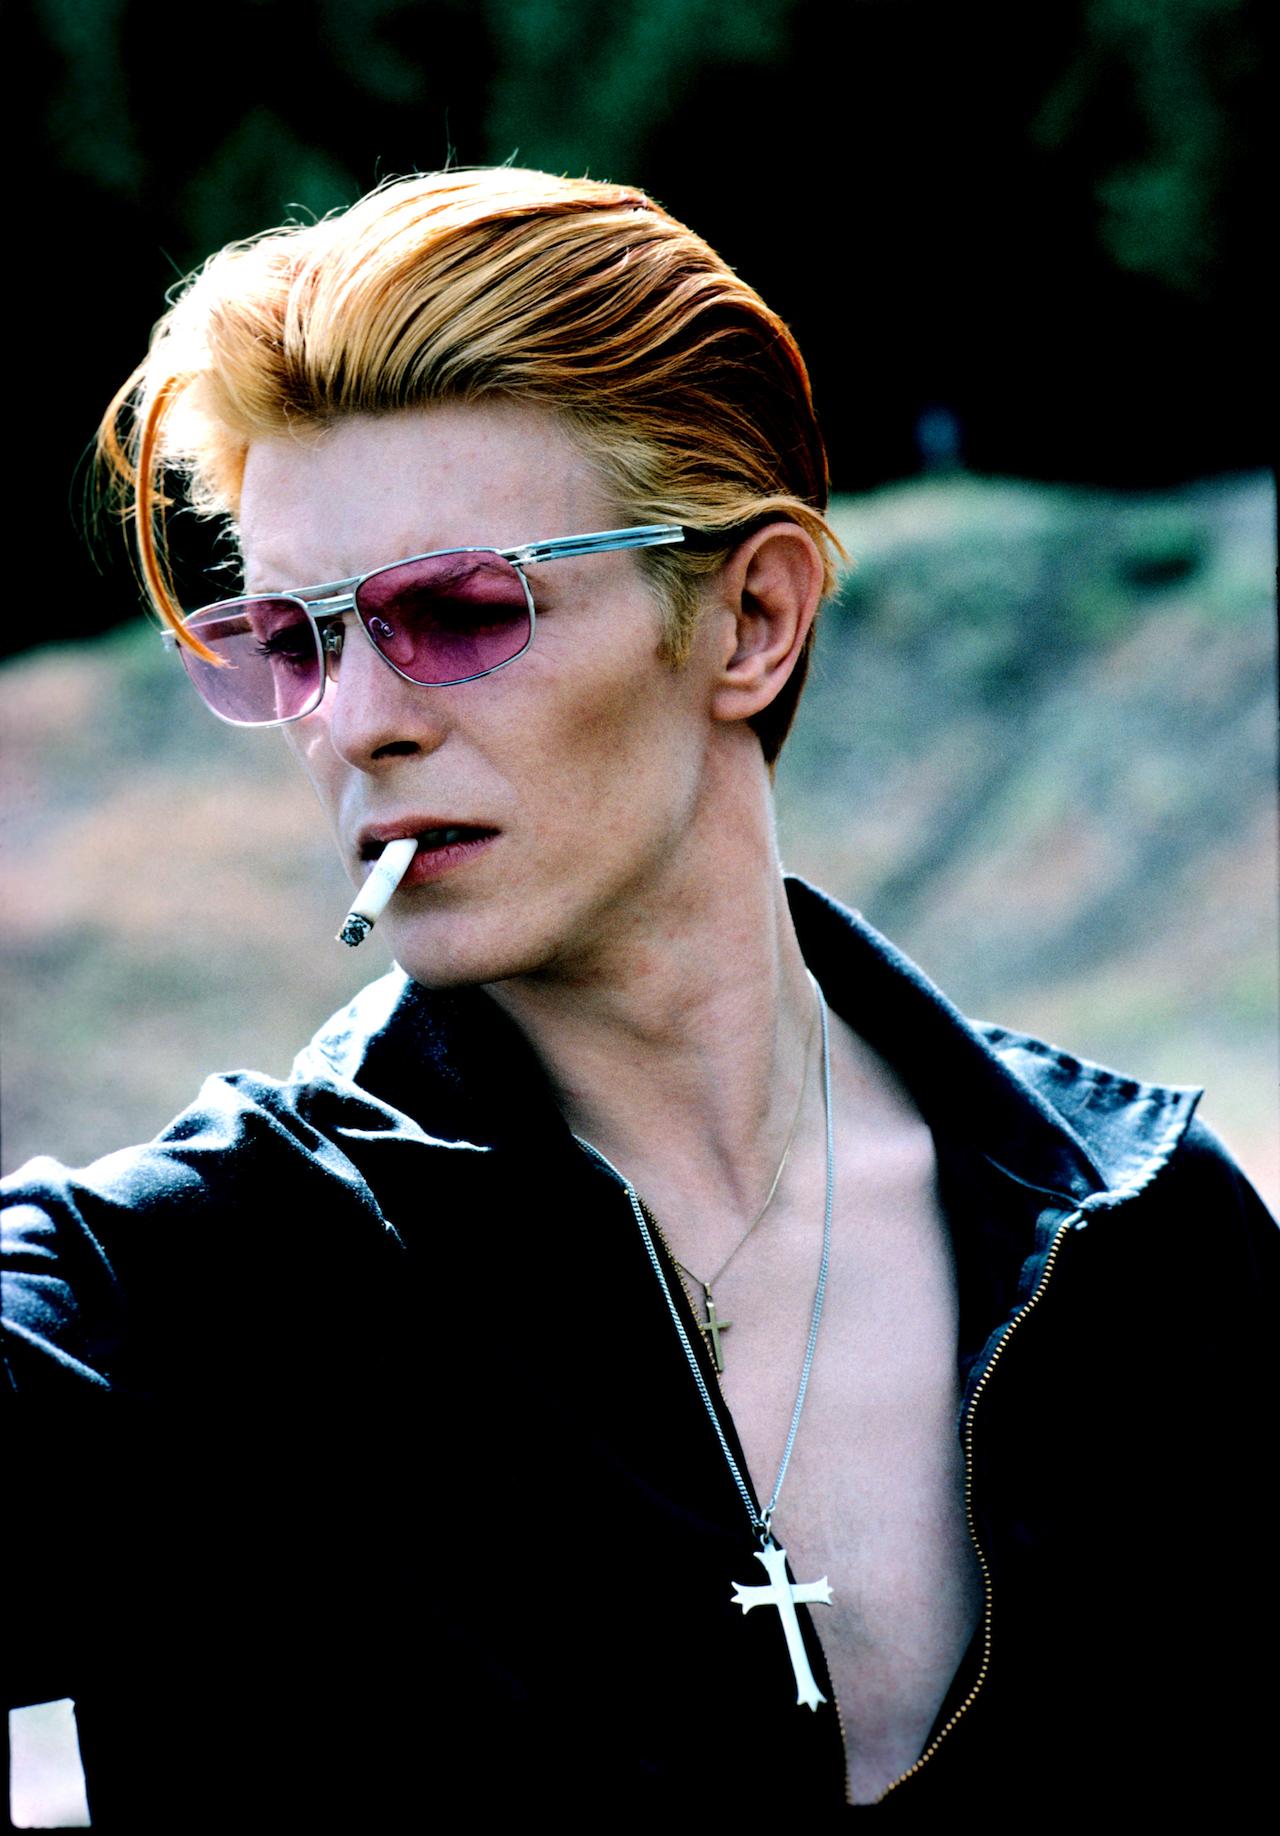 7 LR Bowie Rolling Stone hero (C)